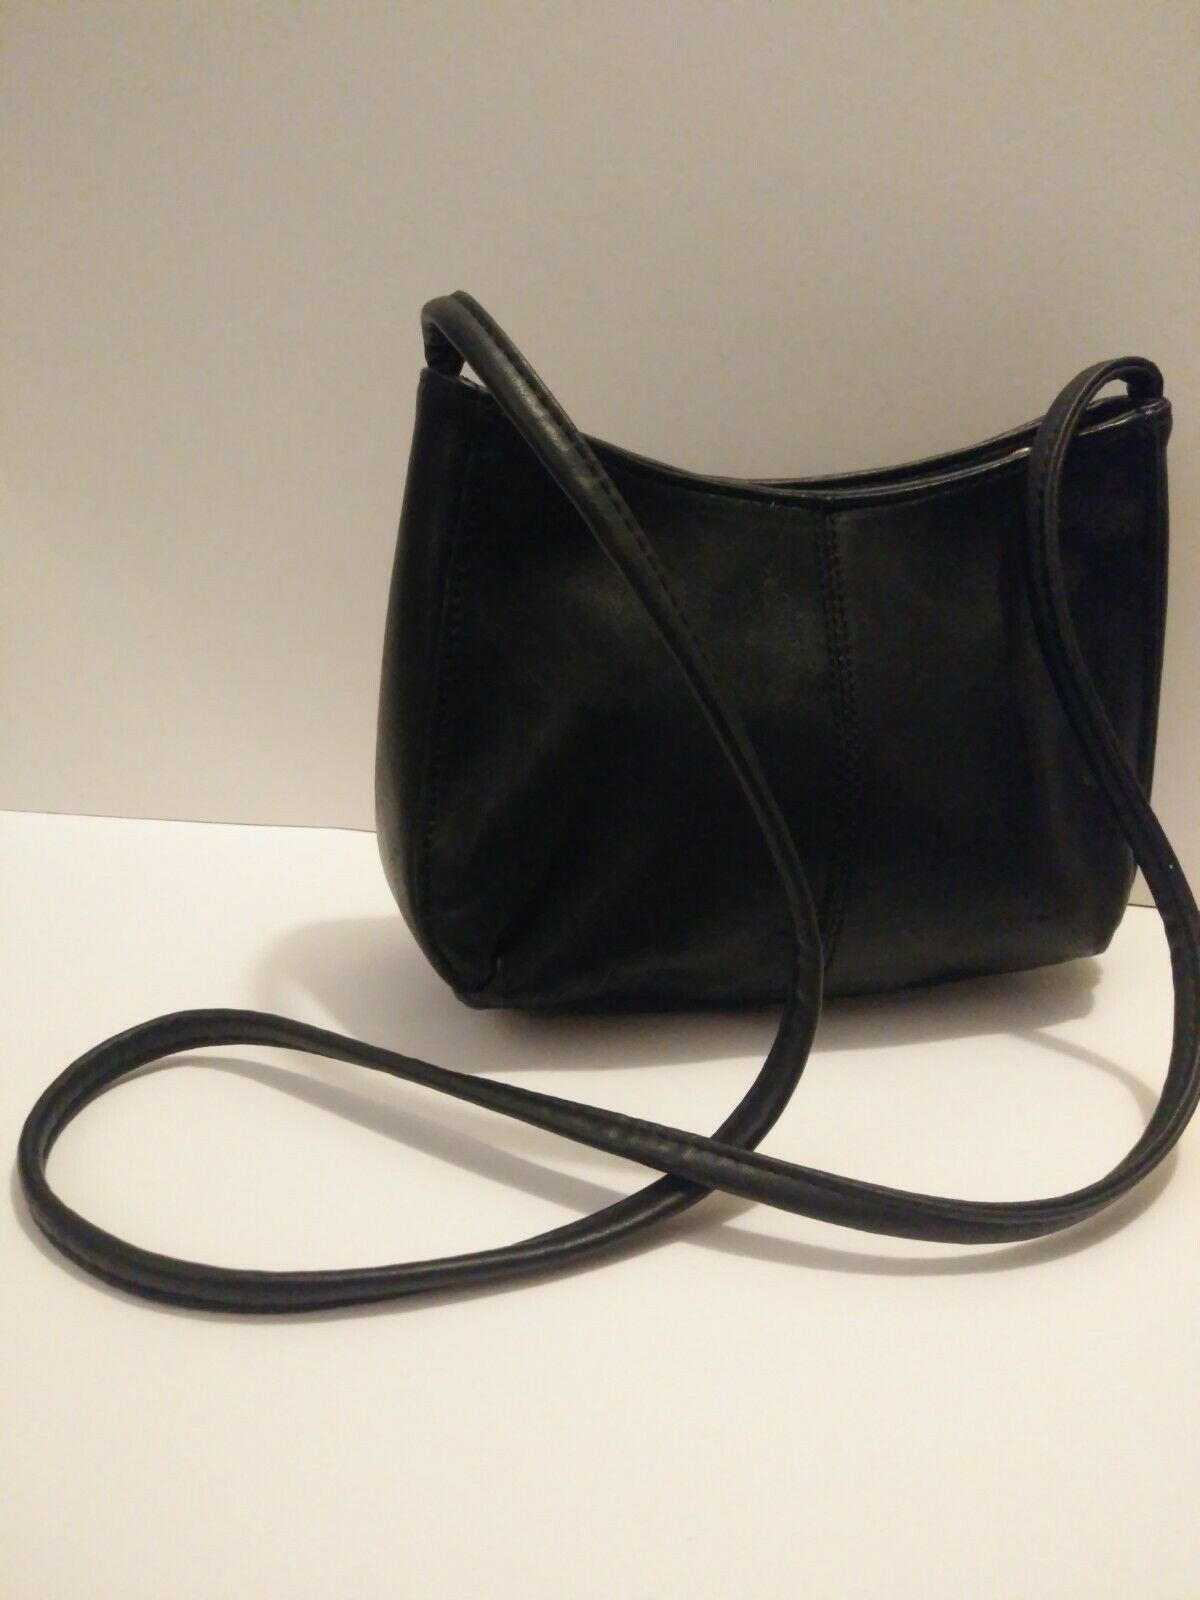 St John's Bay Black Leather Mini Shoulder Handbag Purse Small Size